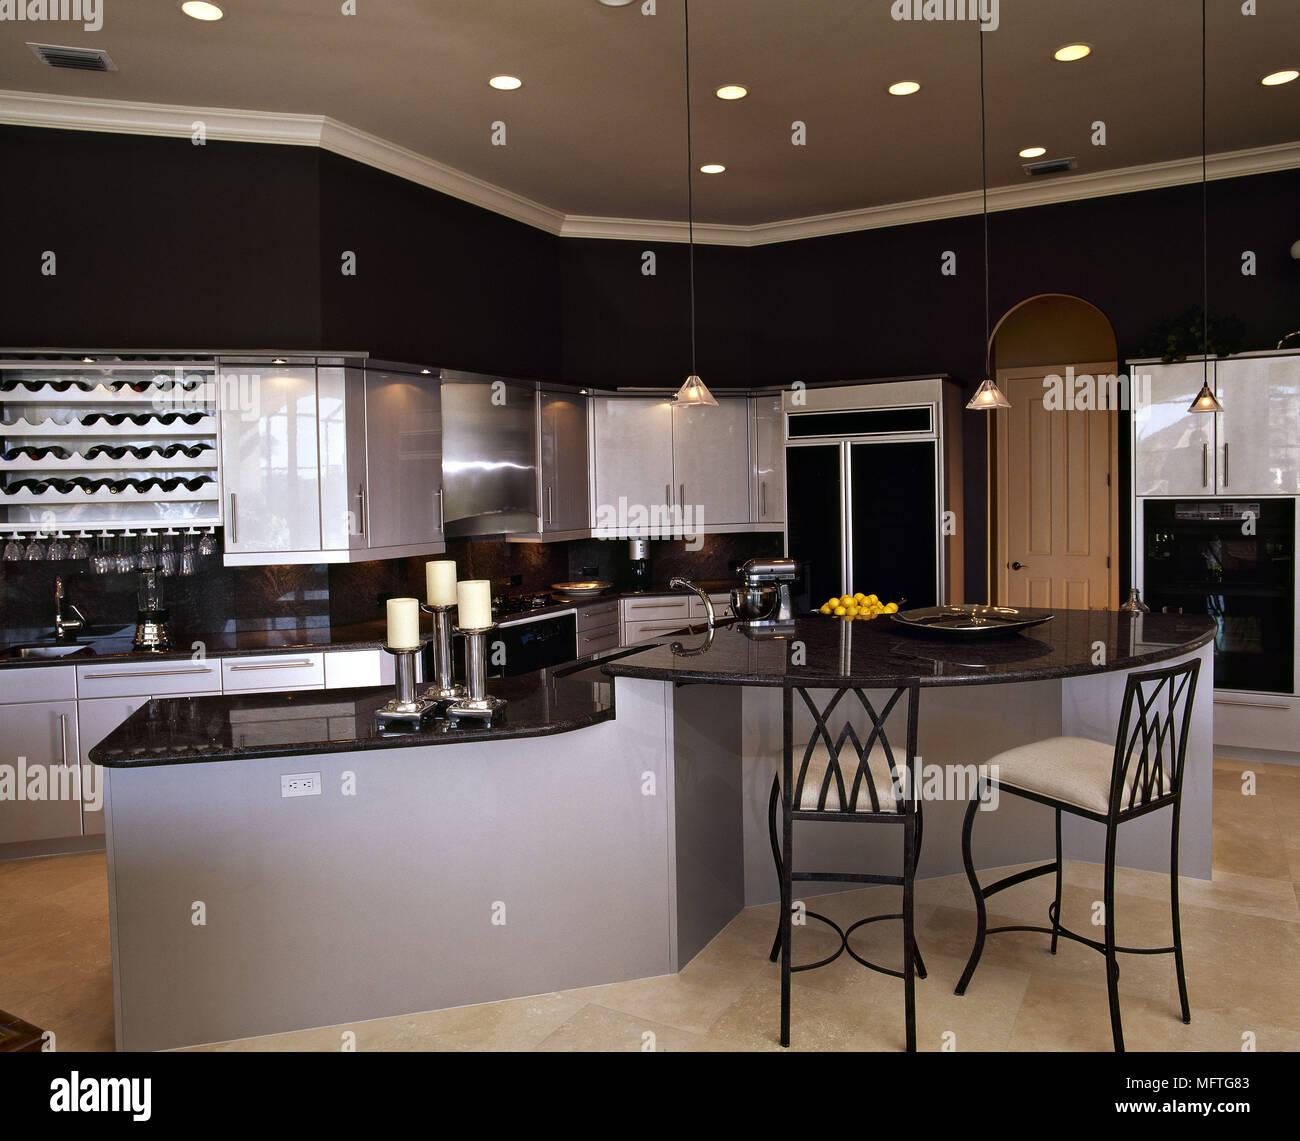 Moderna cocina encimeras de granito negro unidades gris isla central  desayuno taburetes interiores cocinas cocina- 4e2490b991dd